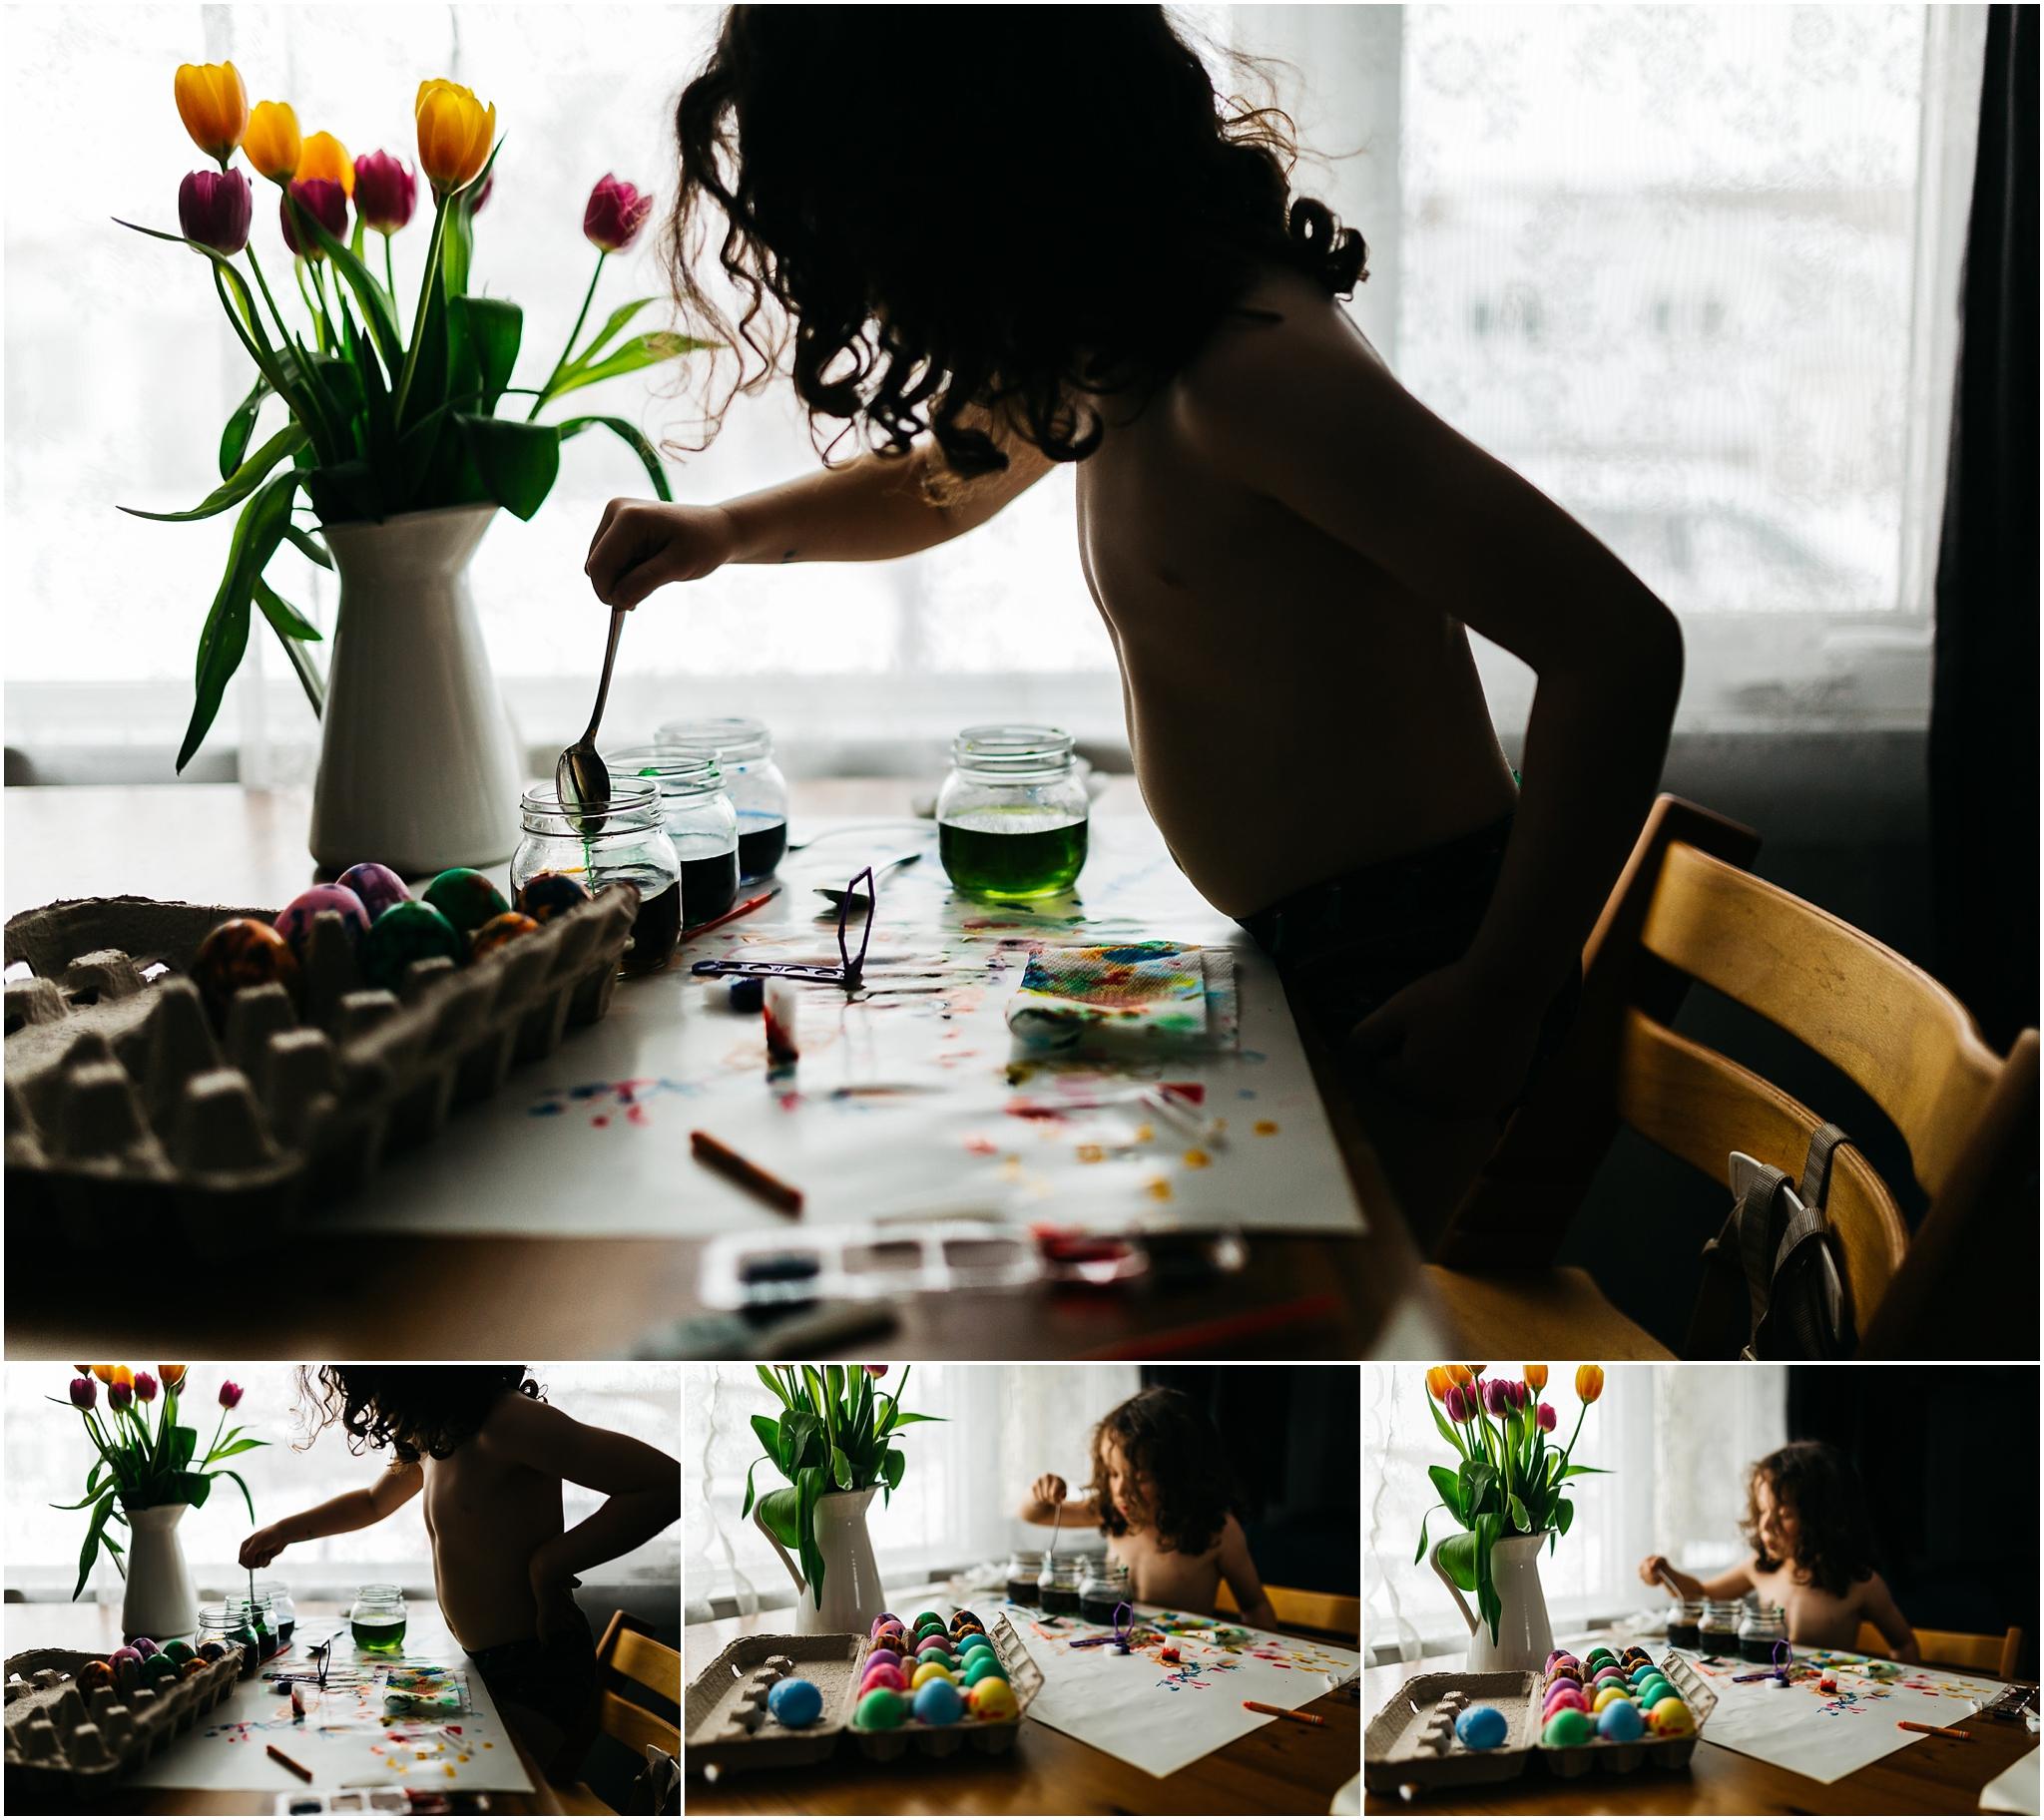 Easter Egg Painting - Edmonton Photographer - Edmonton Family Photographer -  Easter Eggs - Easter 2018 - Crayons on Easter Eggs - Edmonton Documentary Photographer - Family Photography - Documentary Photography - Tulips - Dramatic Light - Tripp Trapp - Stokke - Ikea Vase - Easter Egg making - paas easter kits